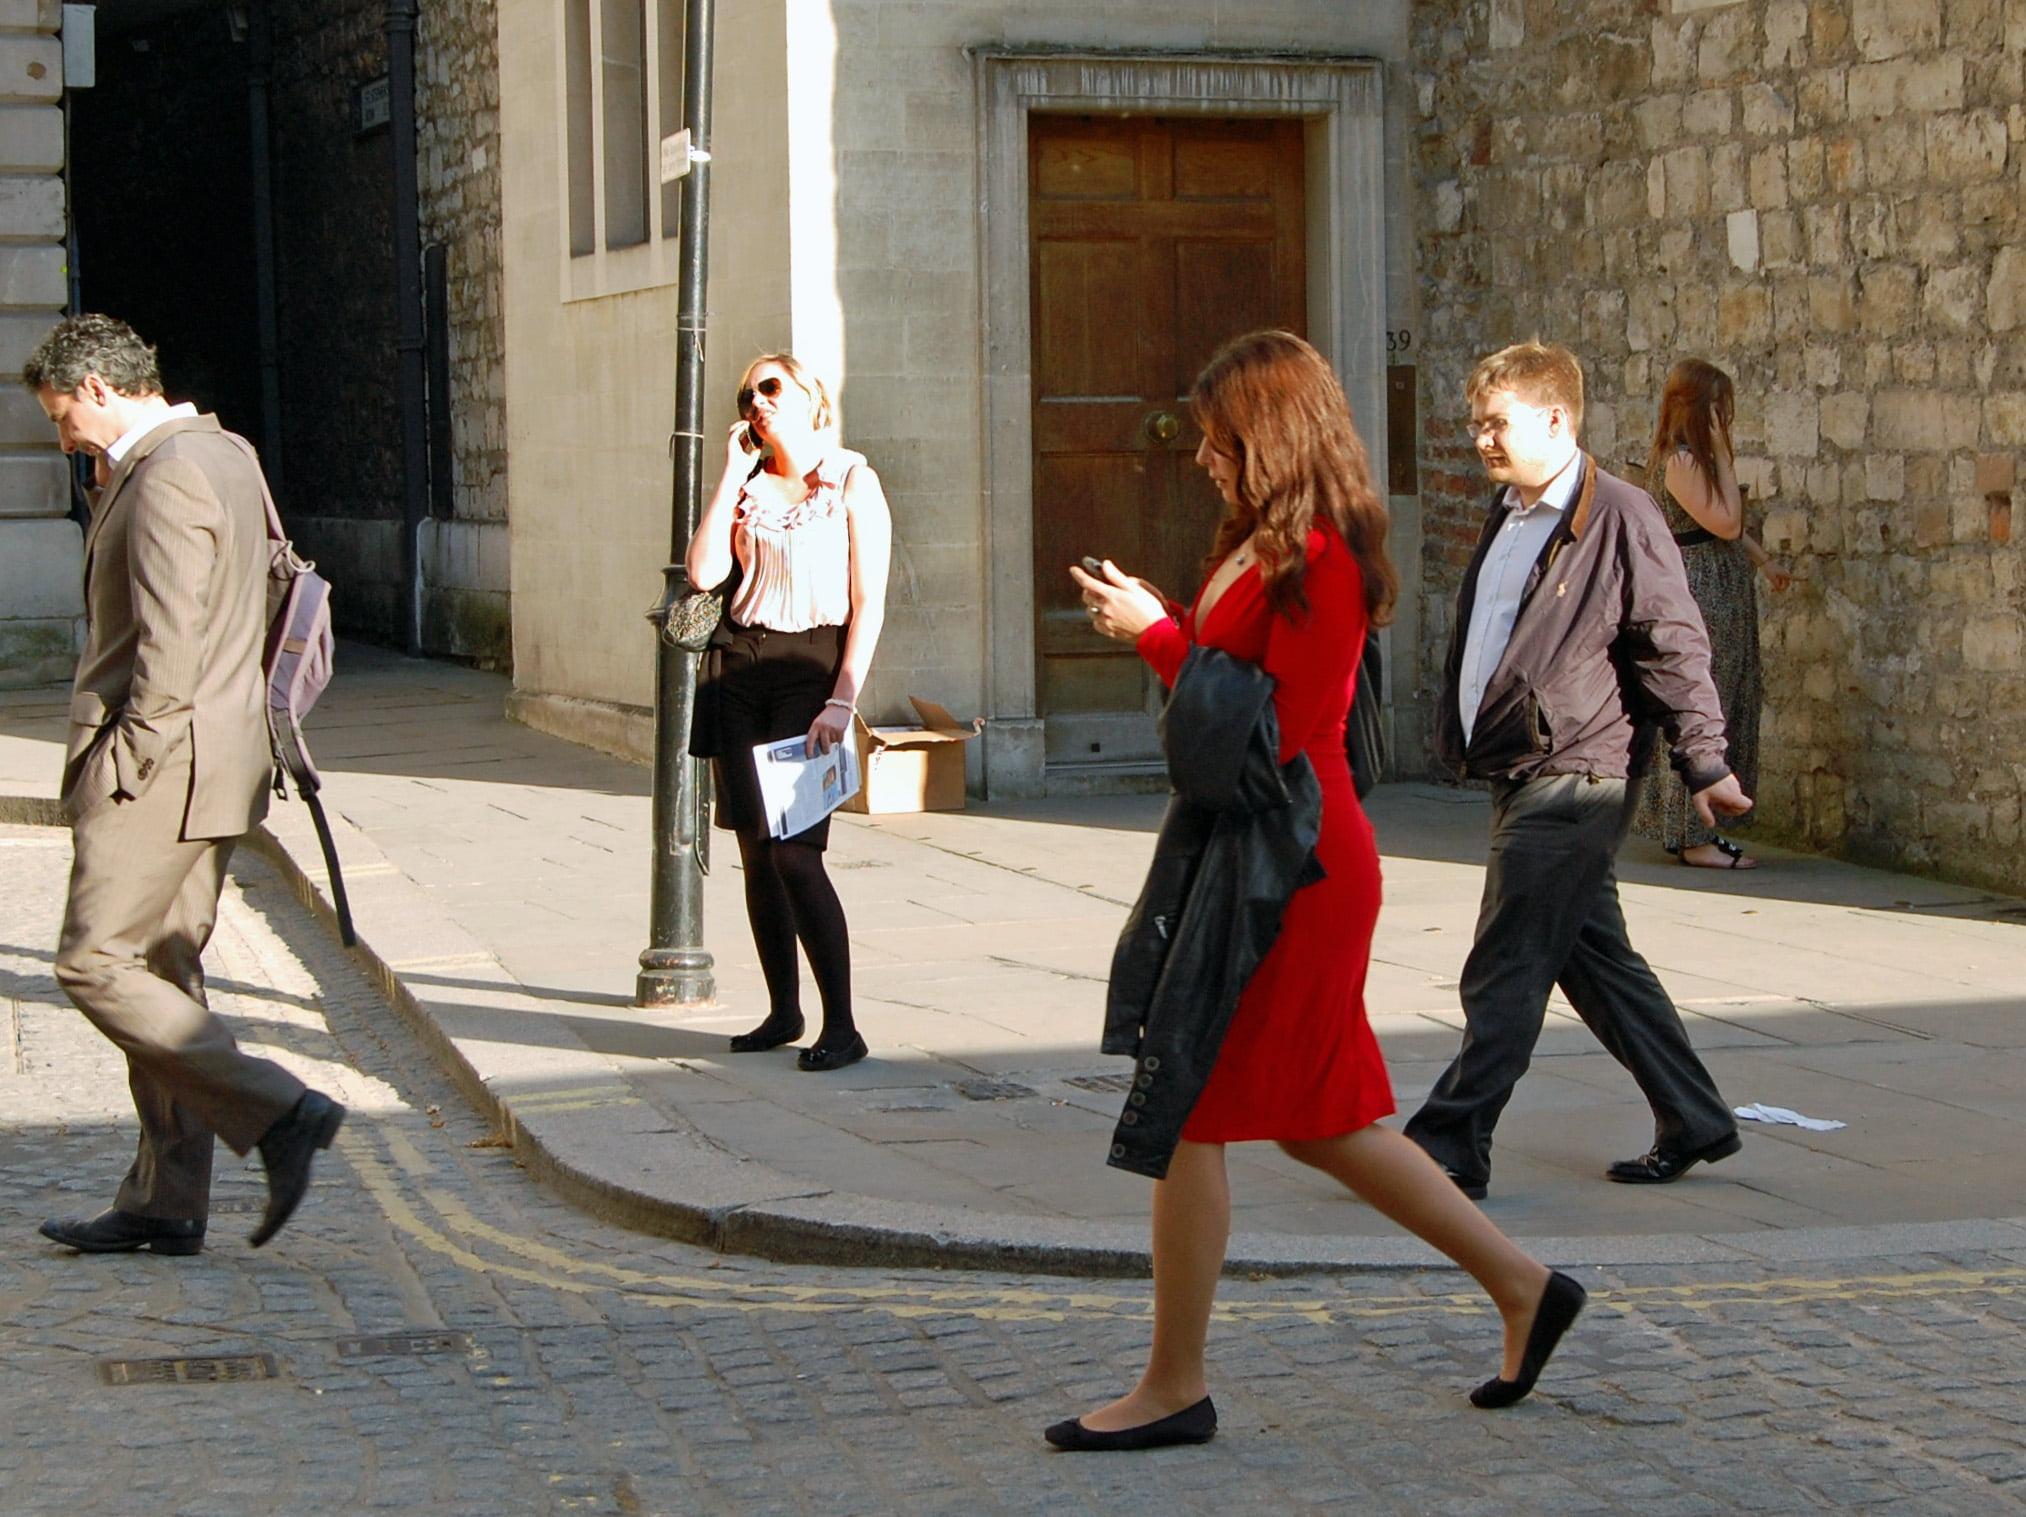 smartphone users crossing street